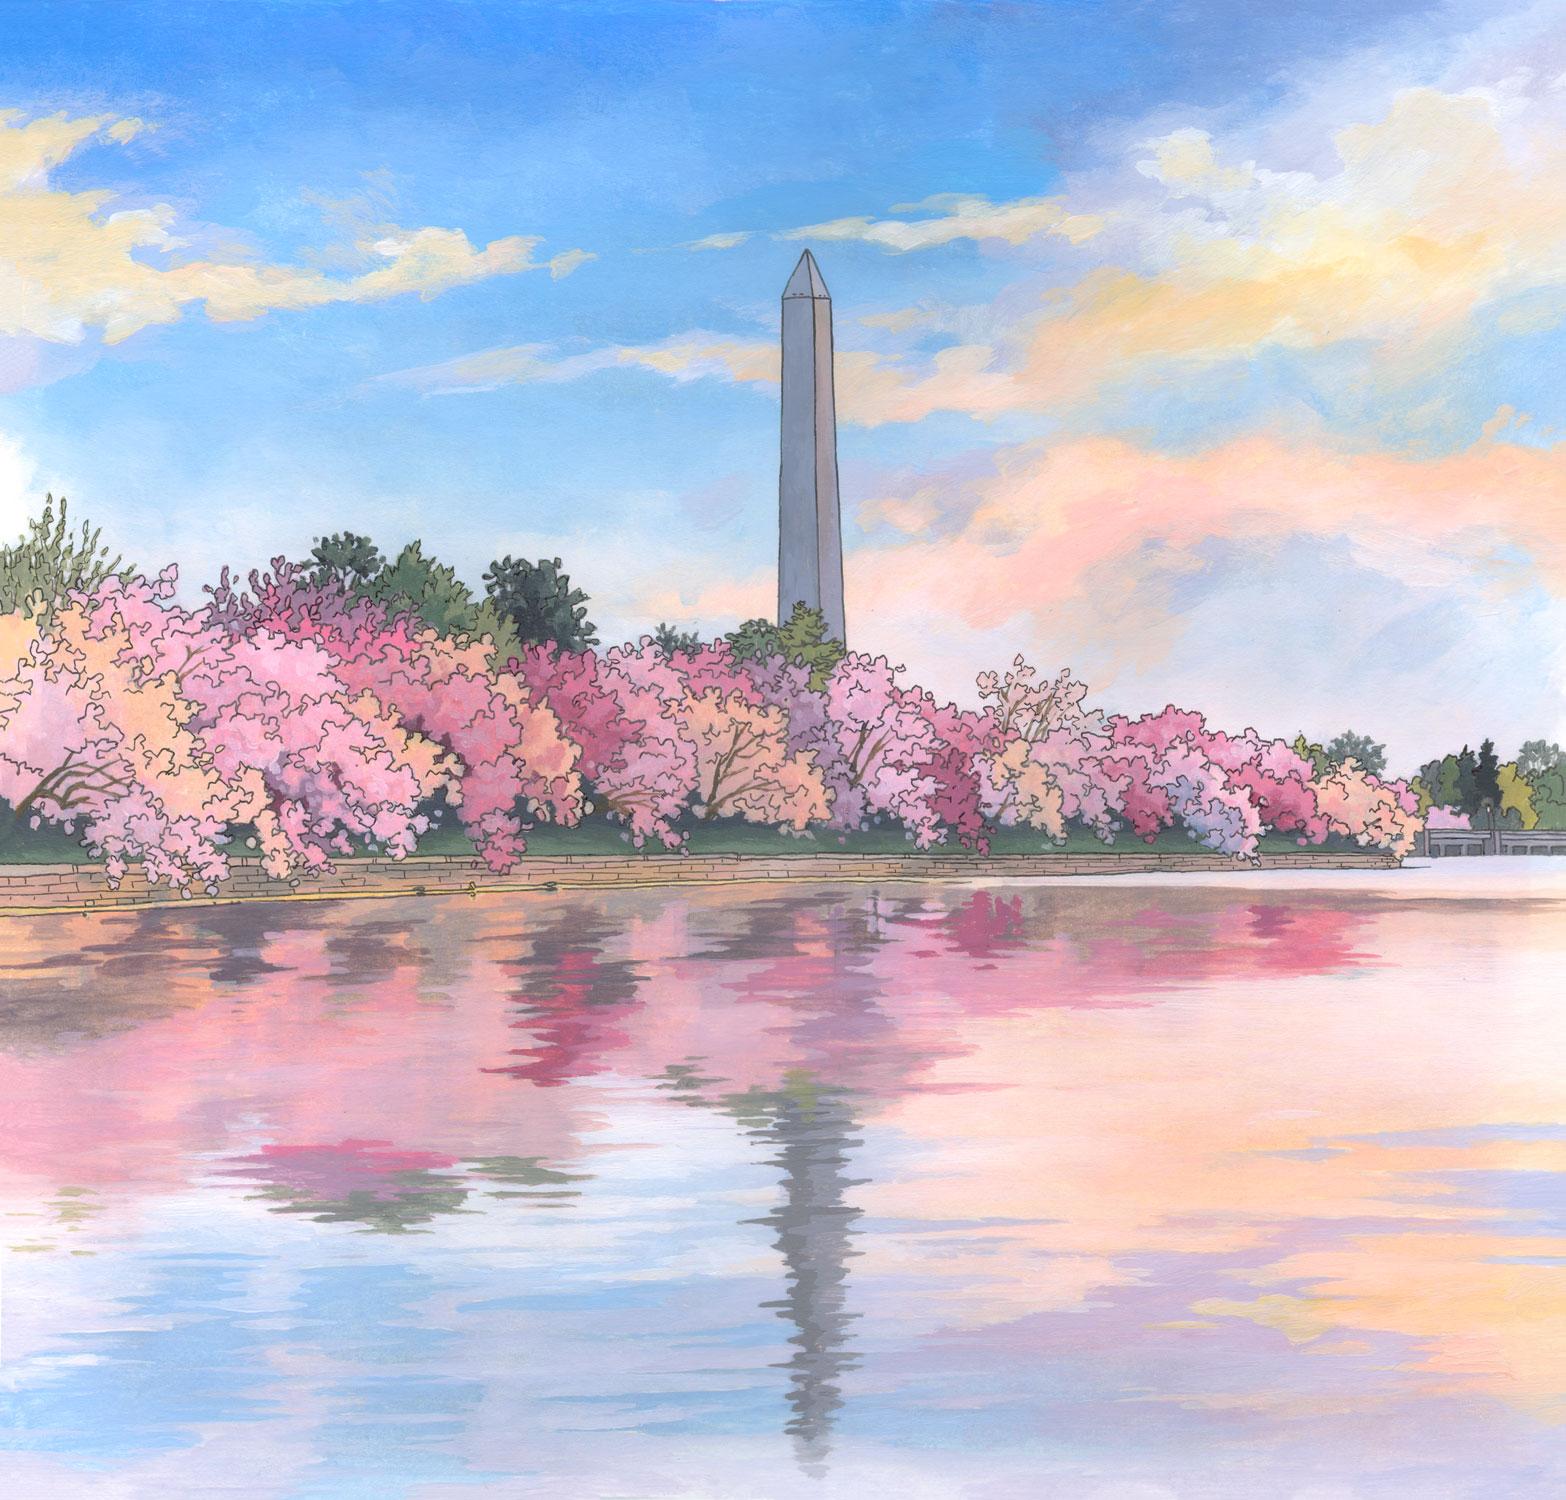 Washington Monument Illustration by Jonathan Chapman